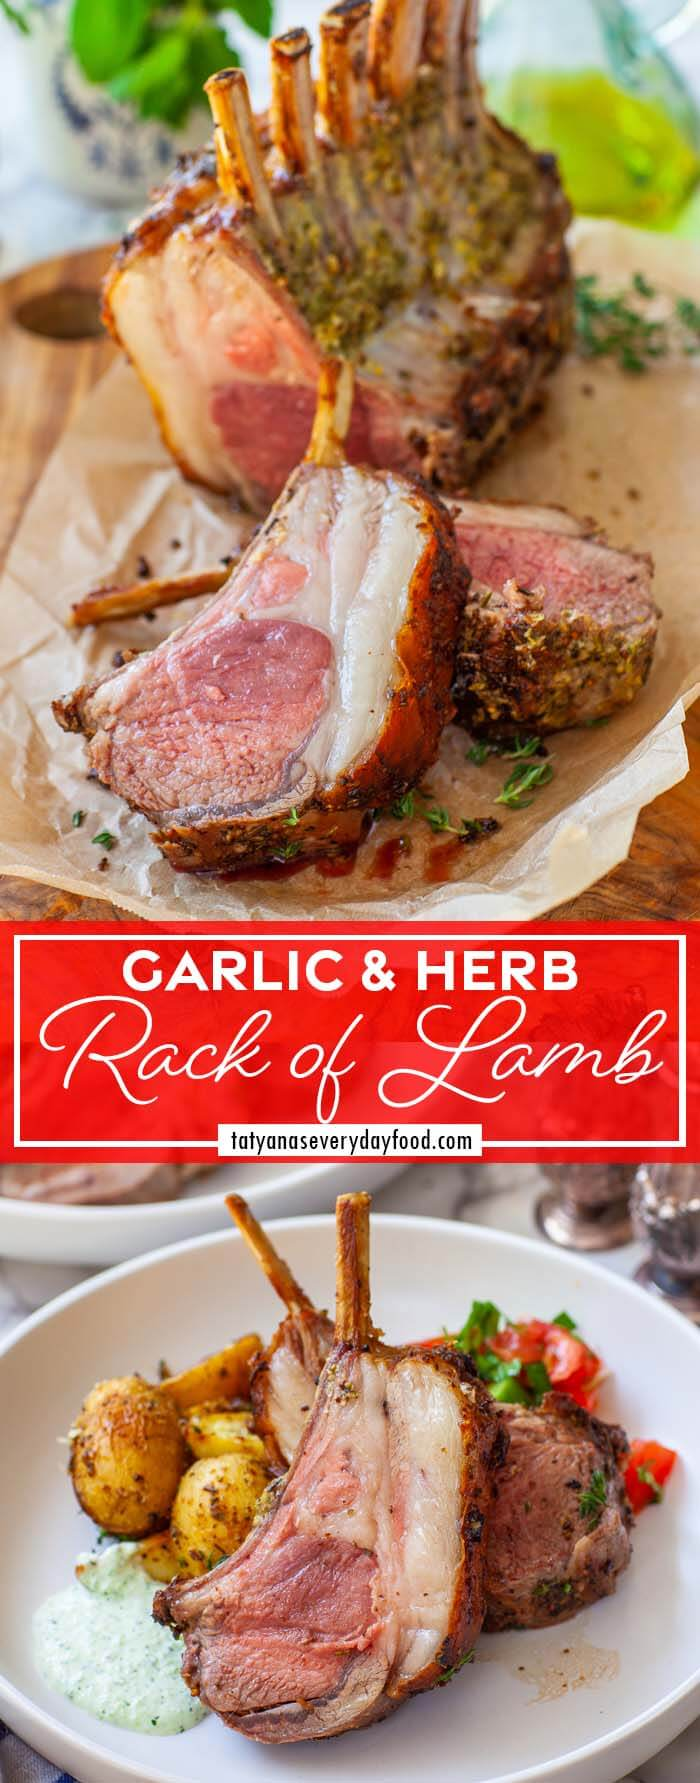 Garlic & Herb Roasted Rack of Lamb video recipe